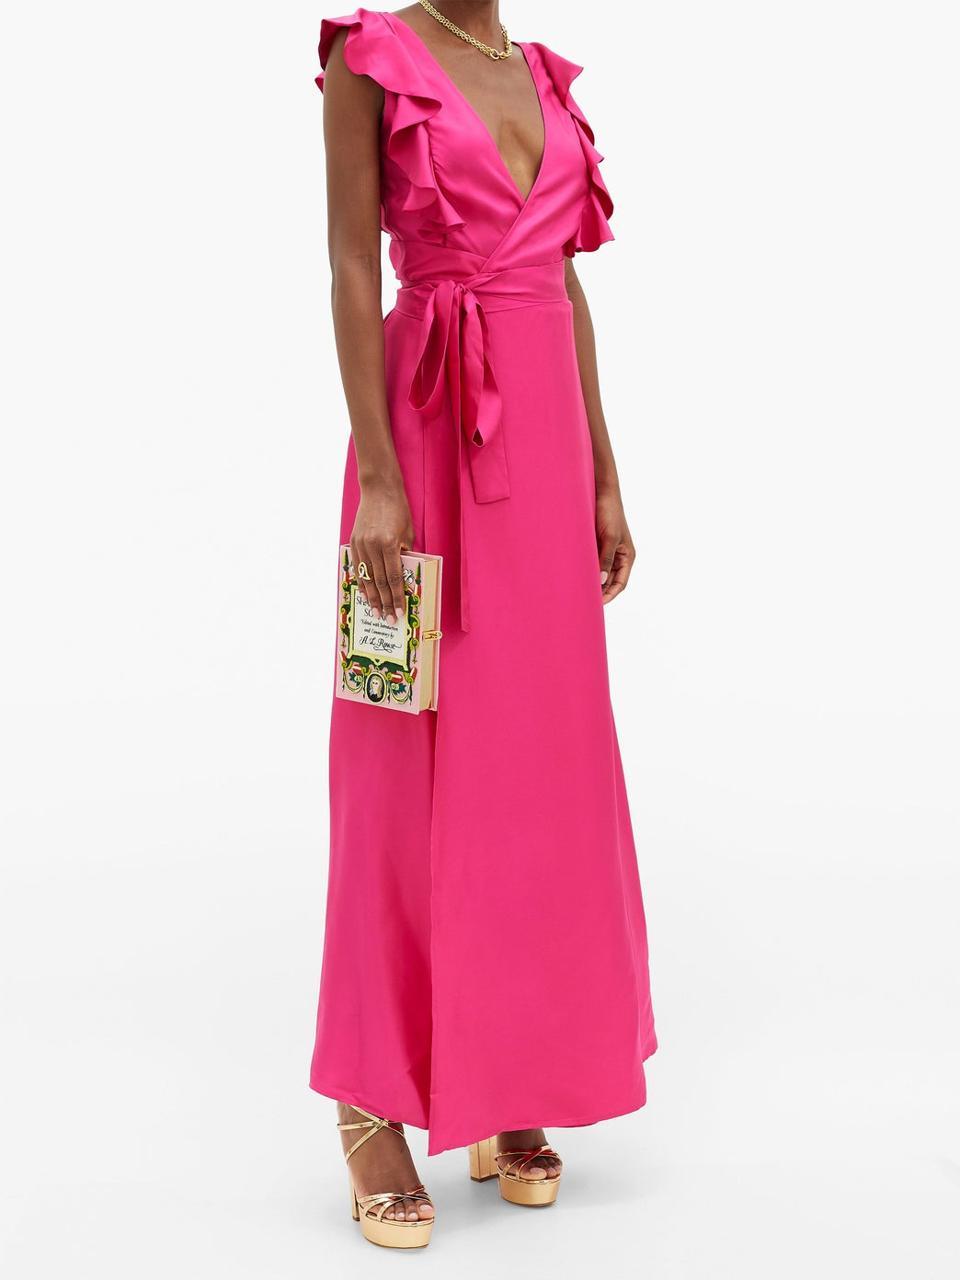 Ruffled Silk-Twill Dress by LA DOUBLEJ